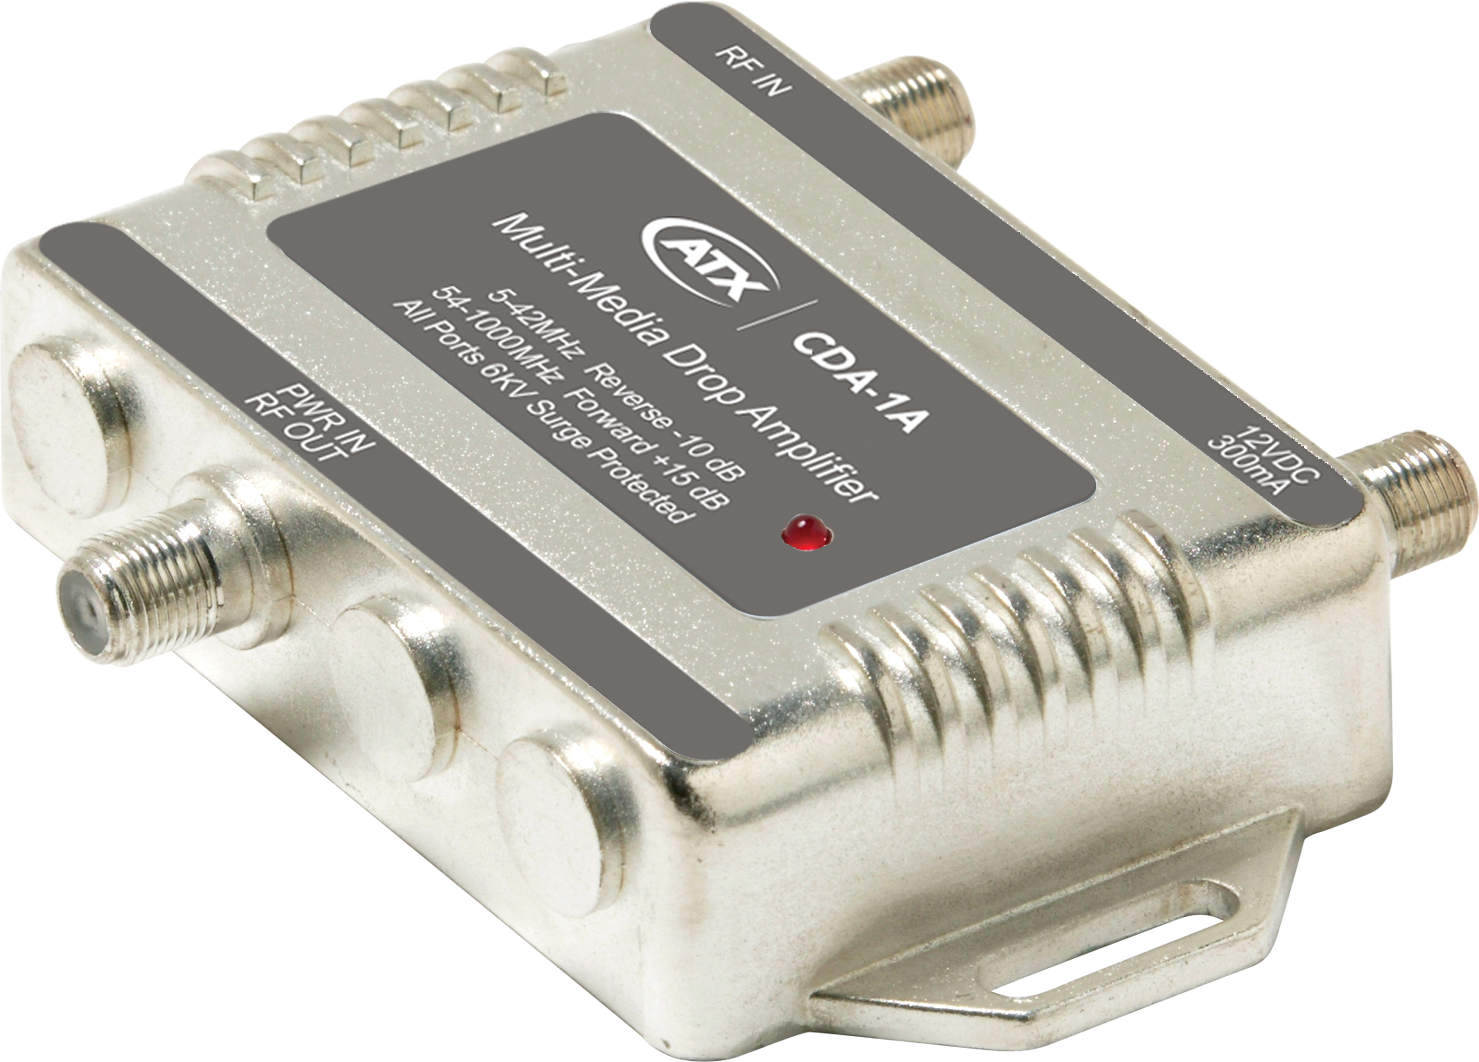 CDA-1A: 1GHz CATV Drop Bi-directional Amplifiers